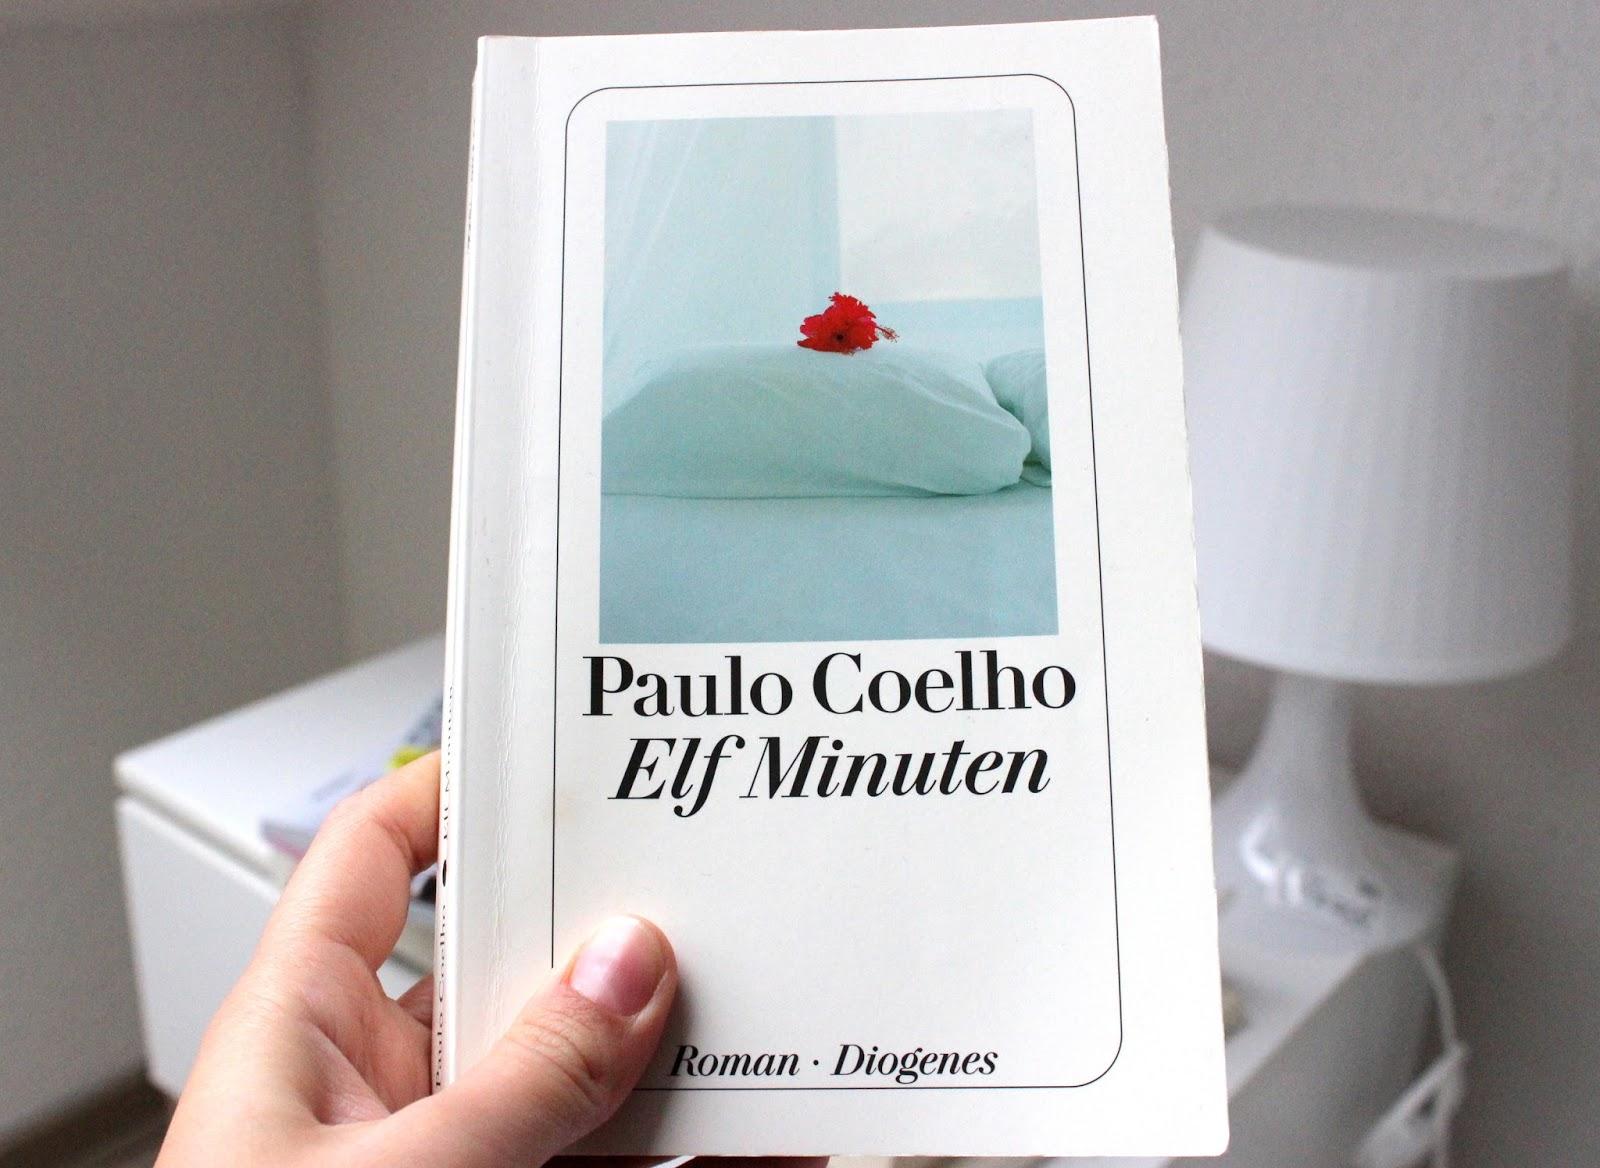 paulo coelho elf minuten review